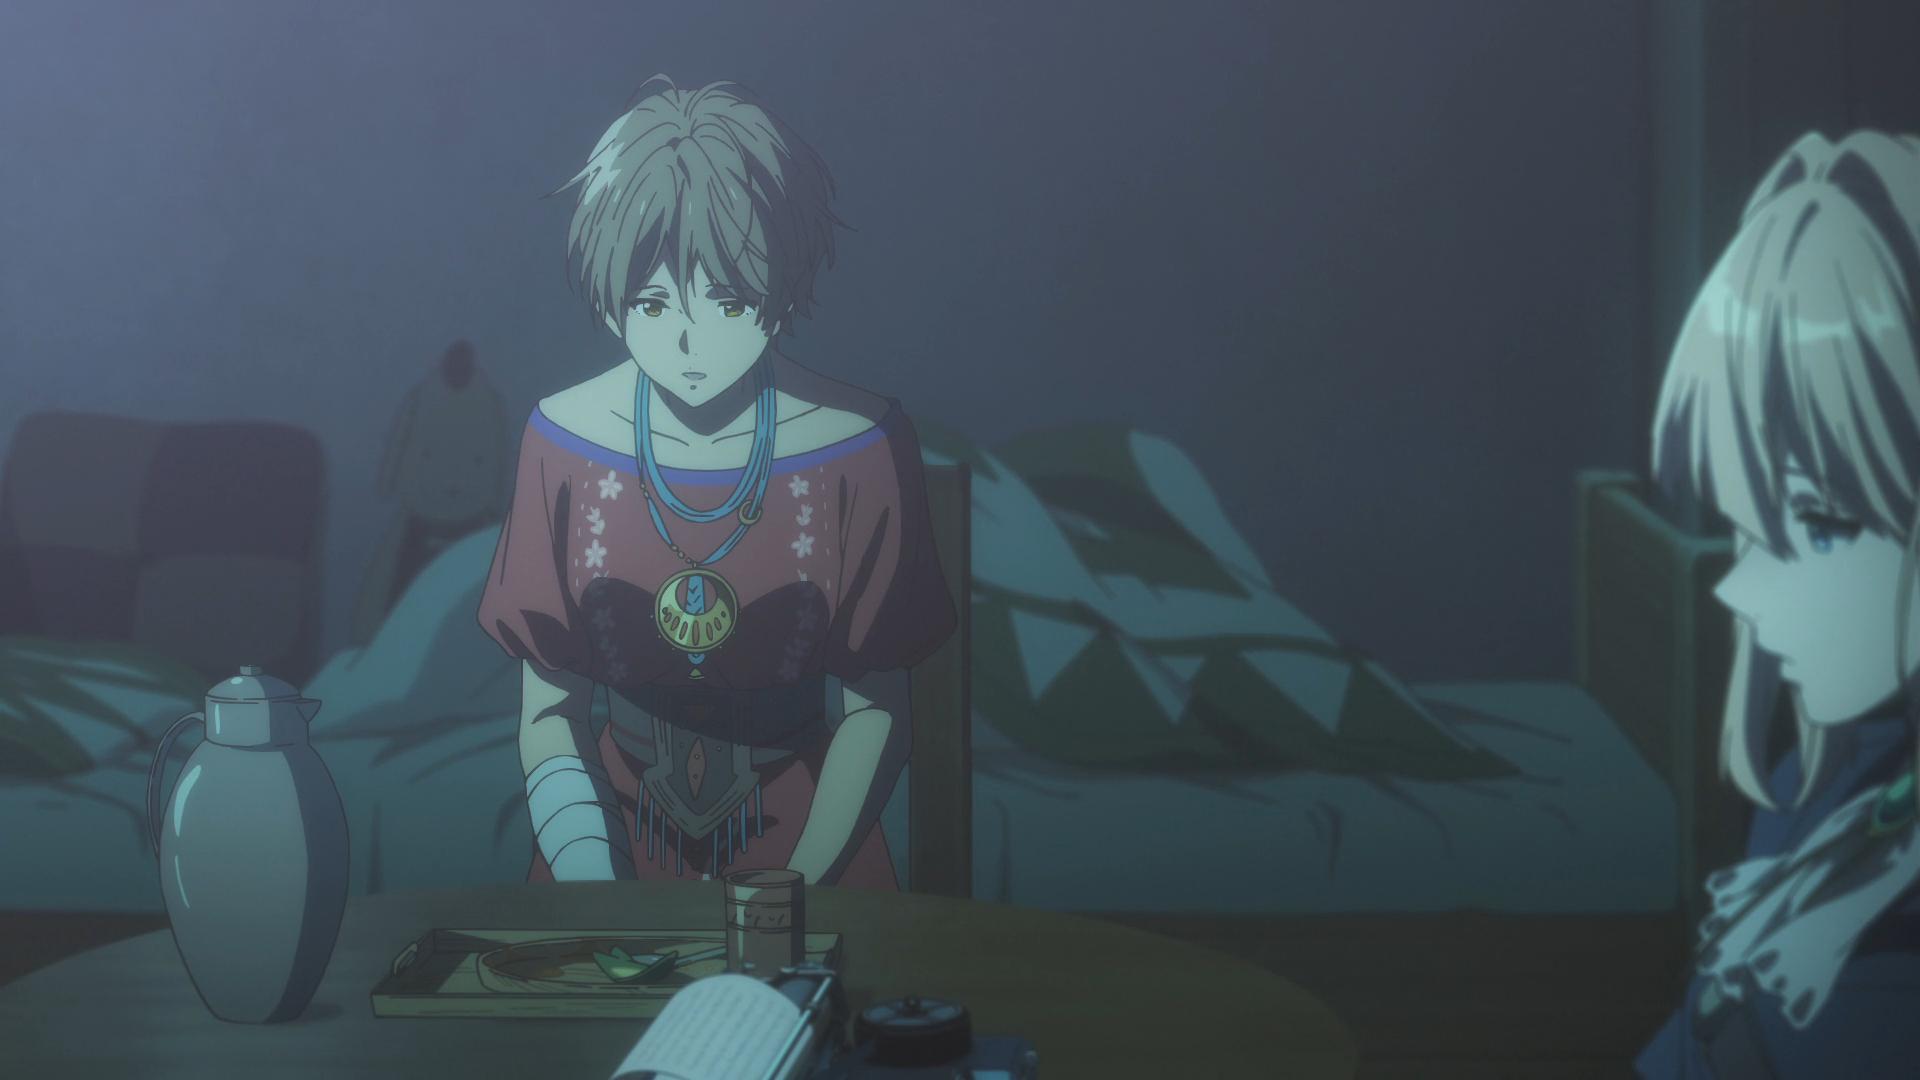 violet-evergarden-episodio-02-08-3